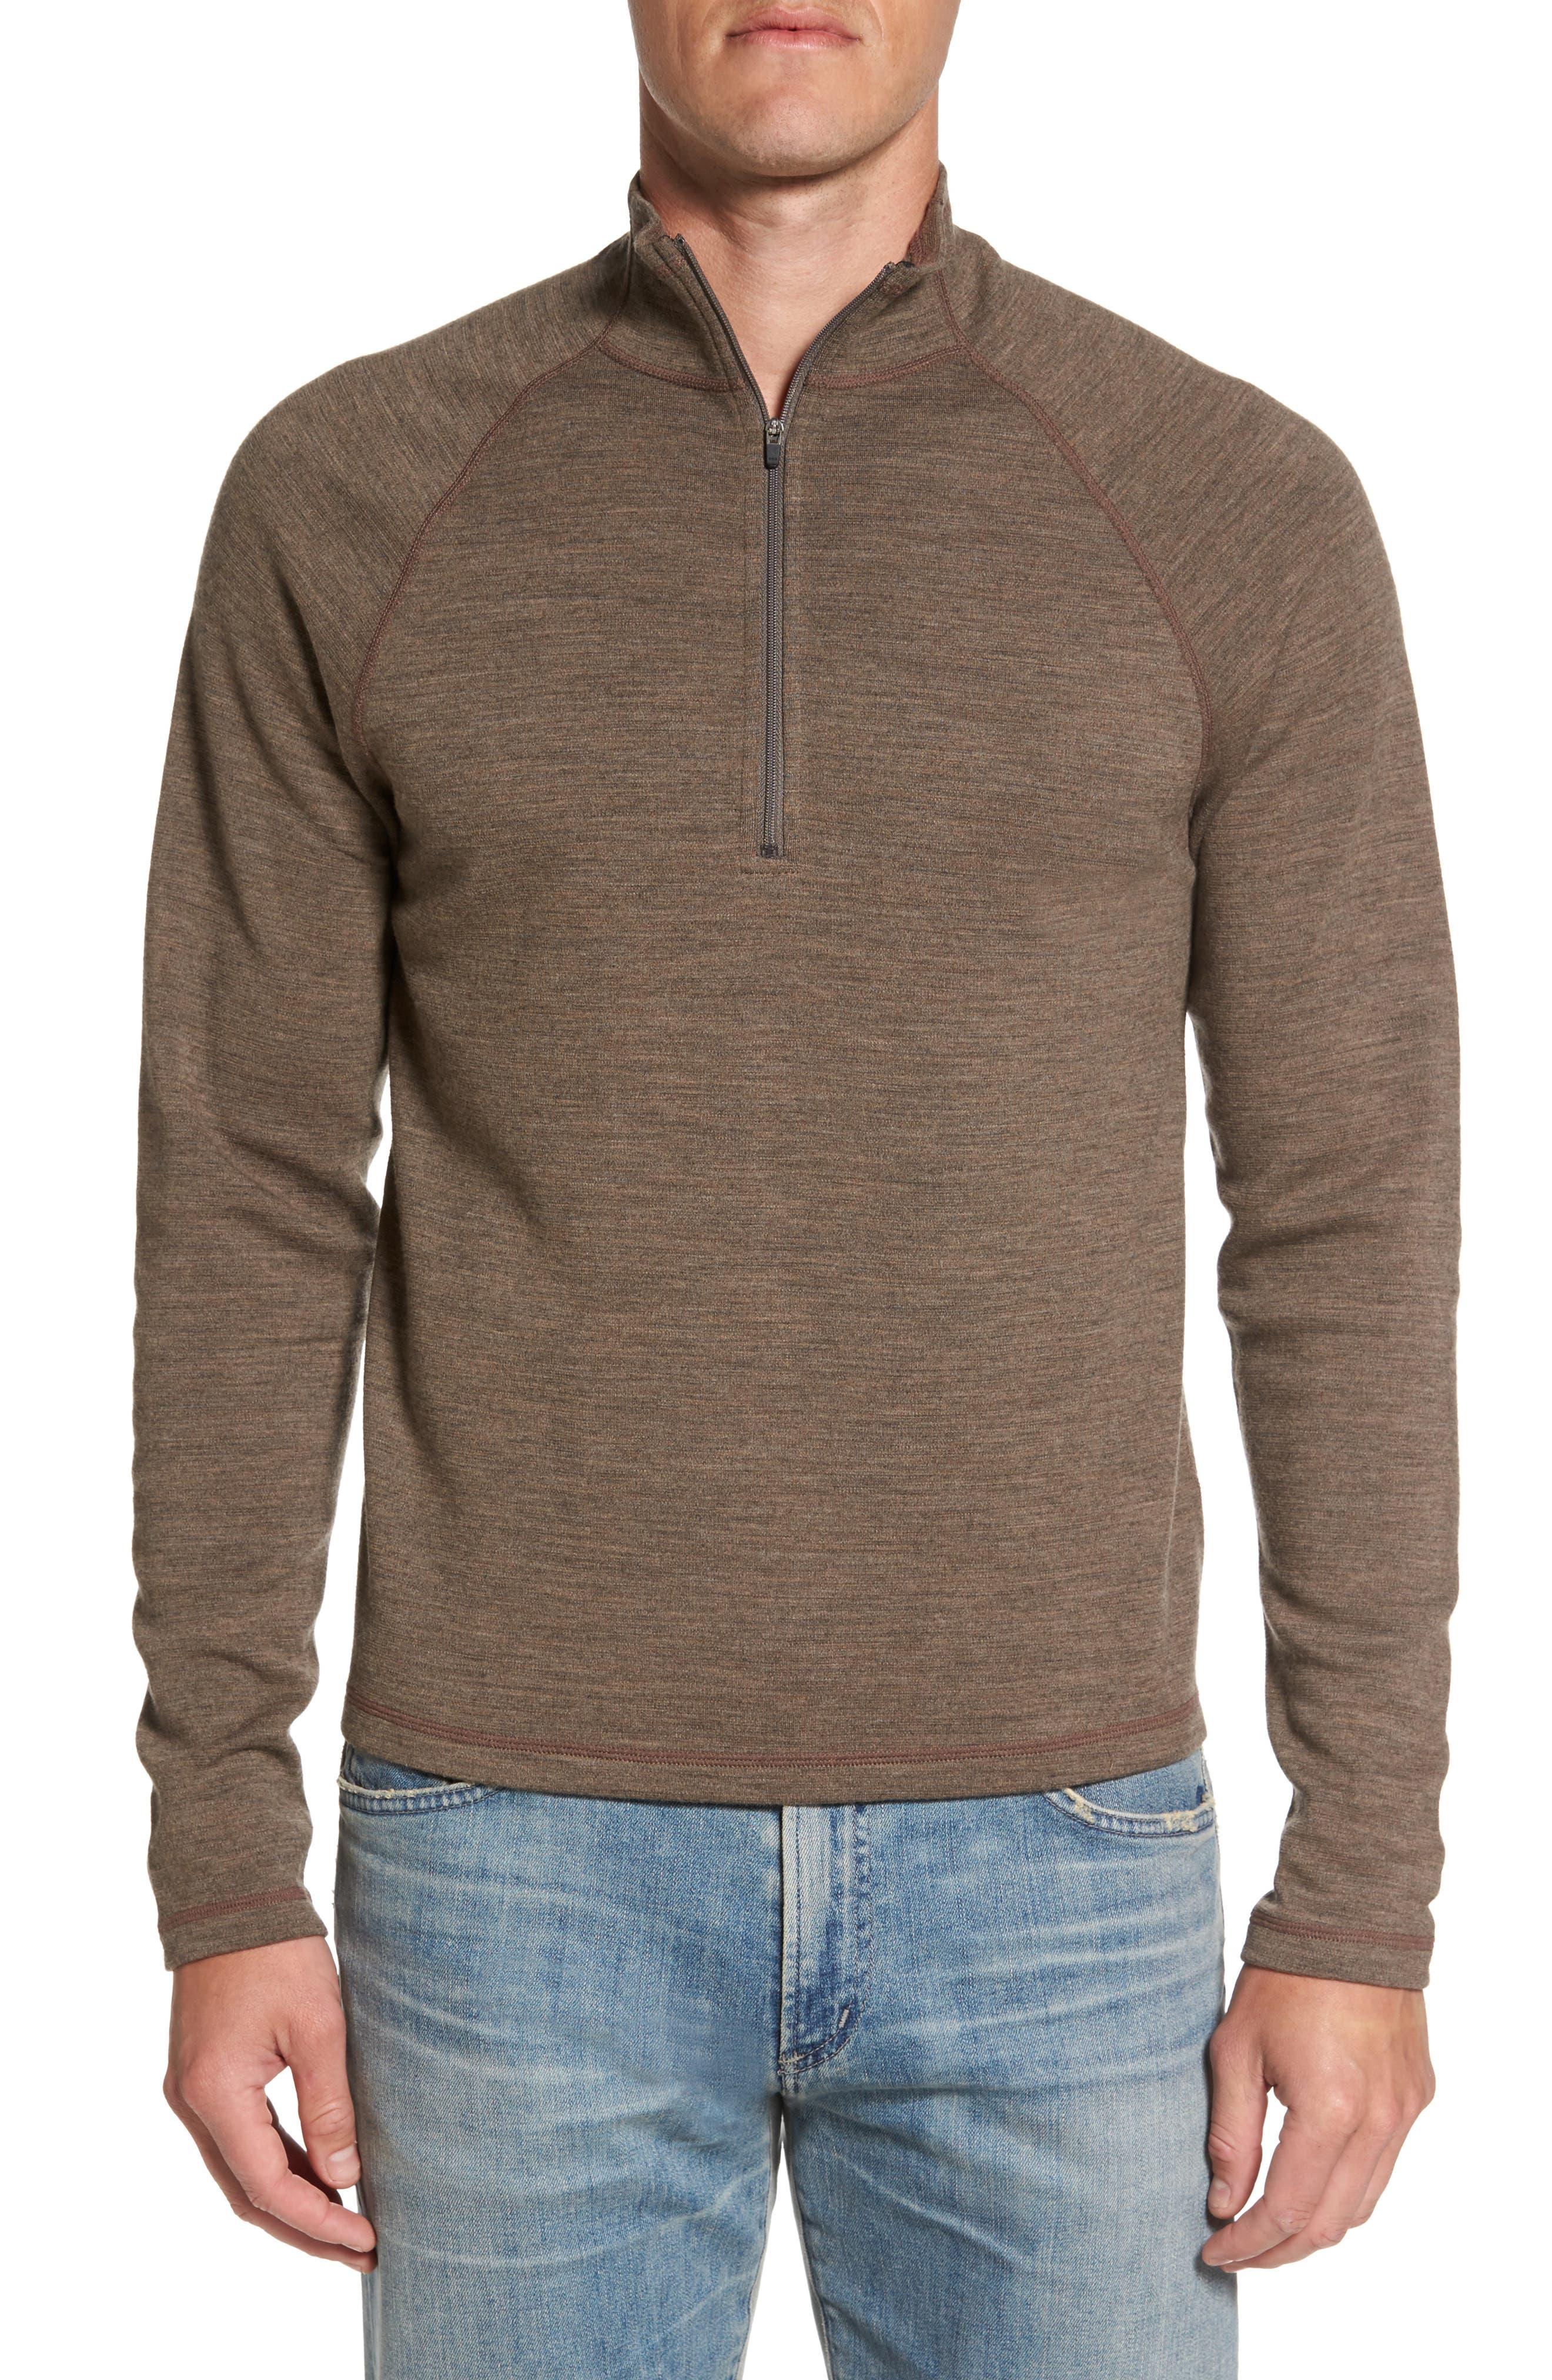 Alternate Image 1 Selected - ibex 'Shak' Merino Wool Quarter Zip Top